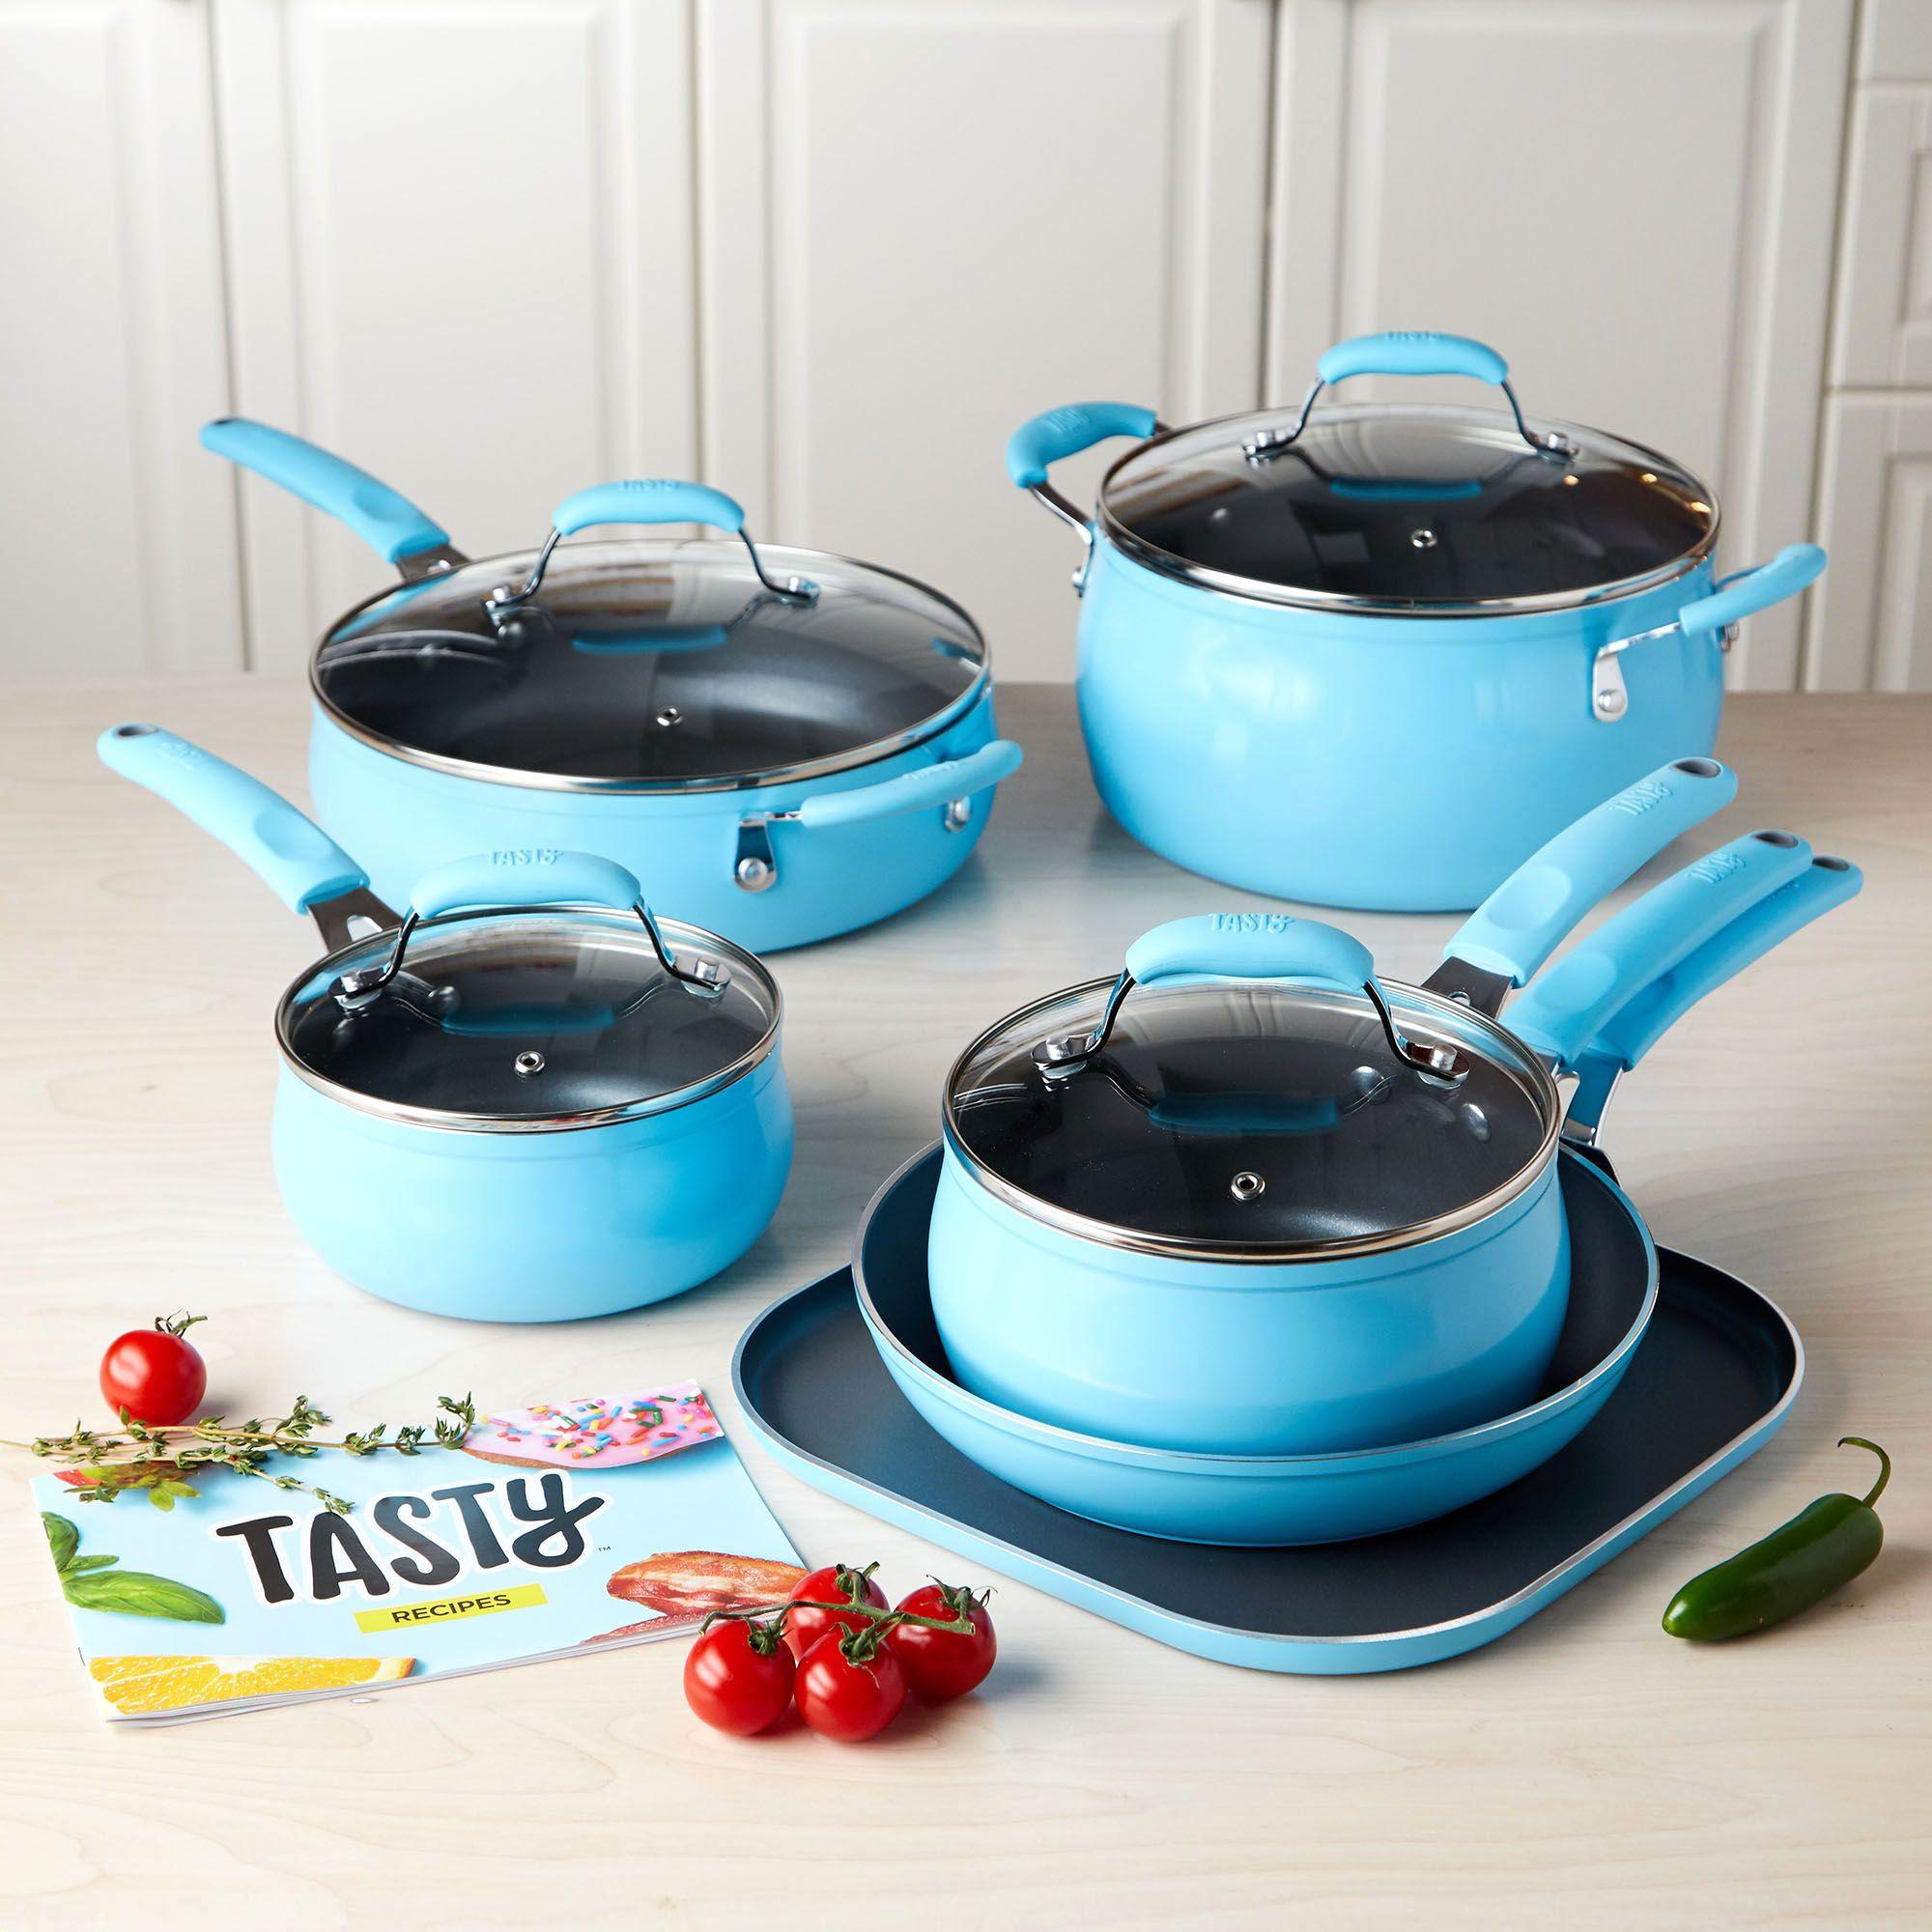 Tasty 11pc Cookware Set Non Stick Diamond Reinforced Blue